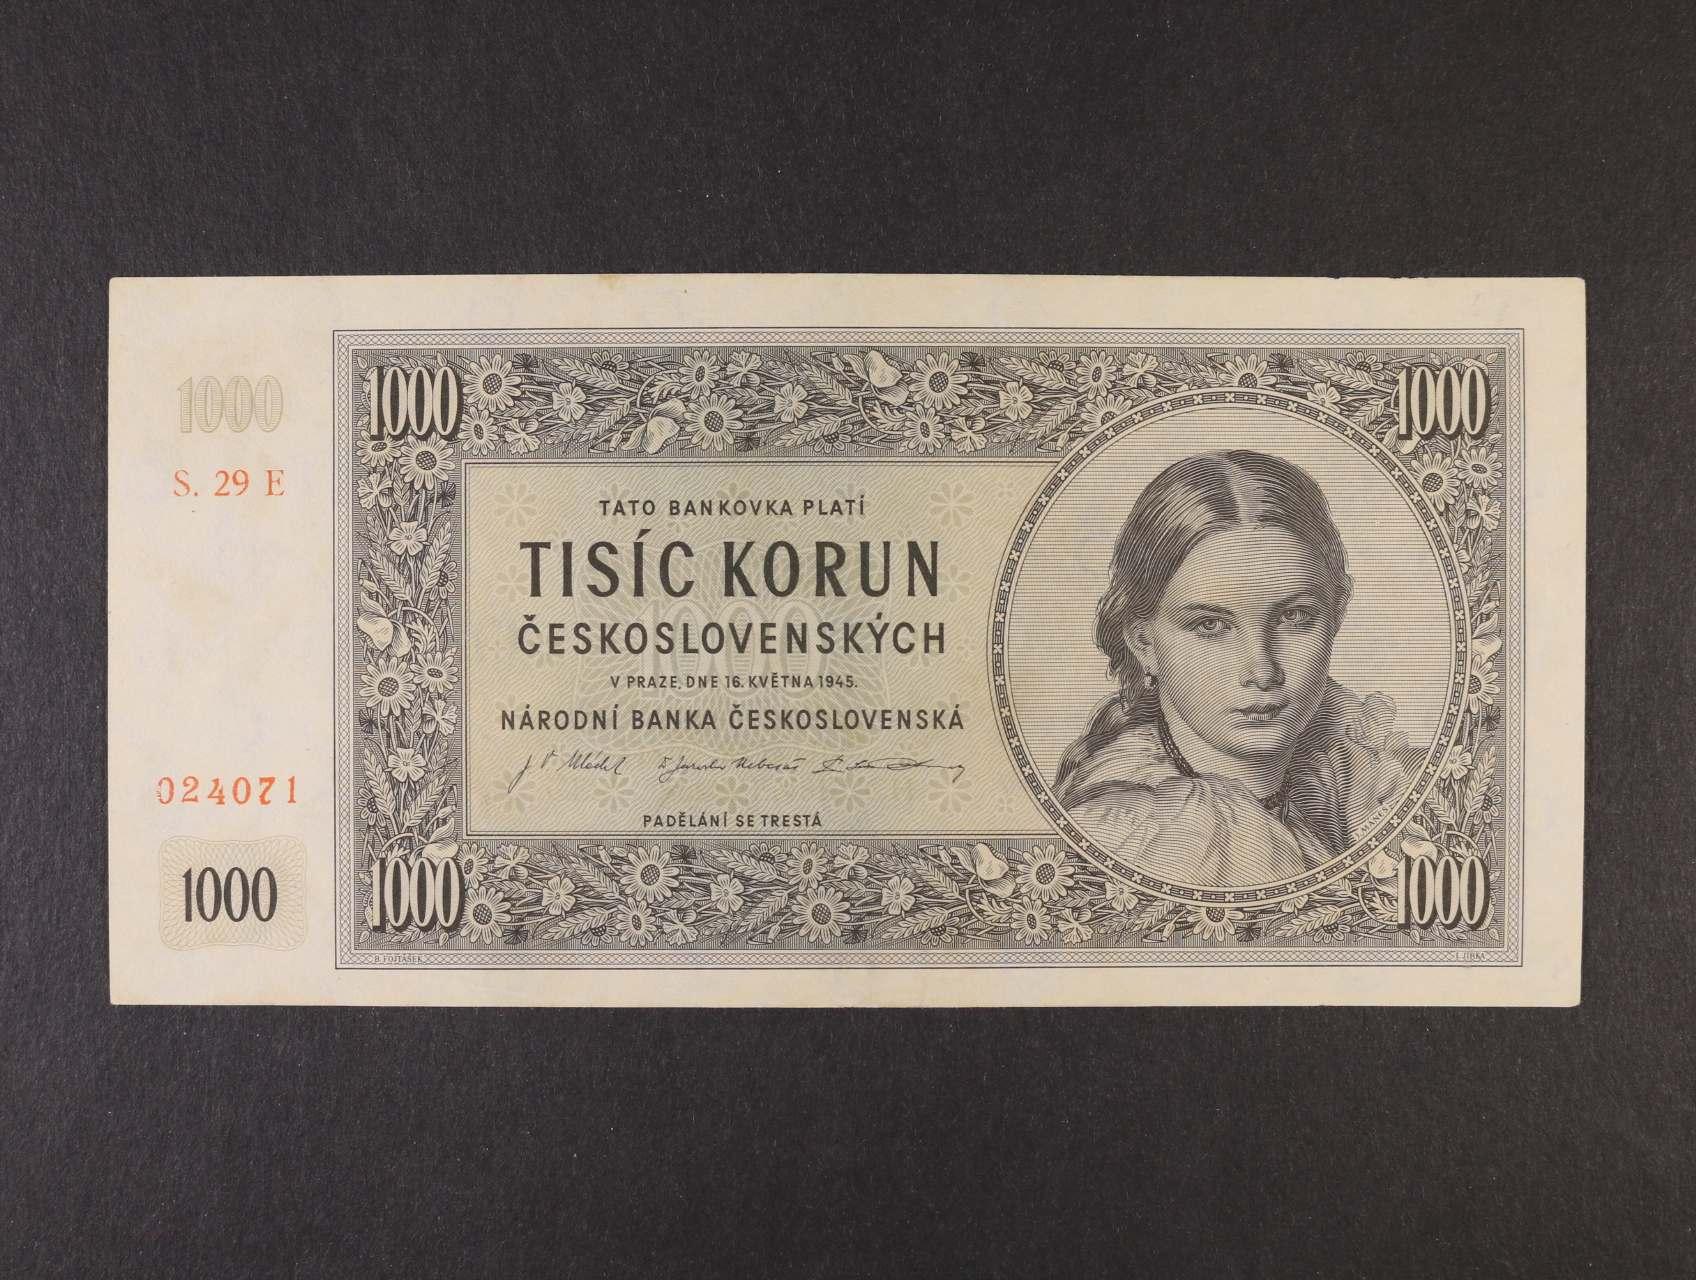 1000 Kčs 16.5.1945 série 29 E, Ba. 78d, Pi. 74d